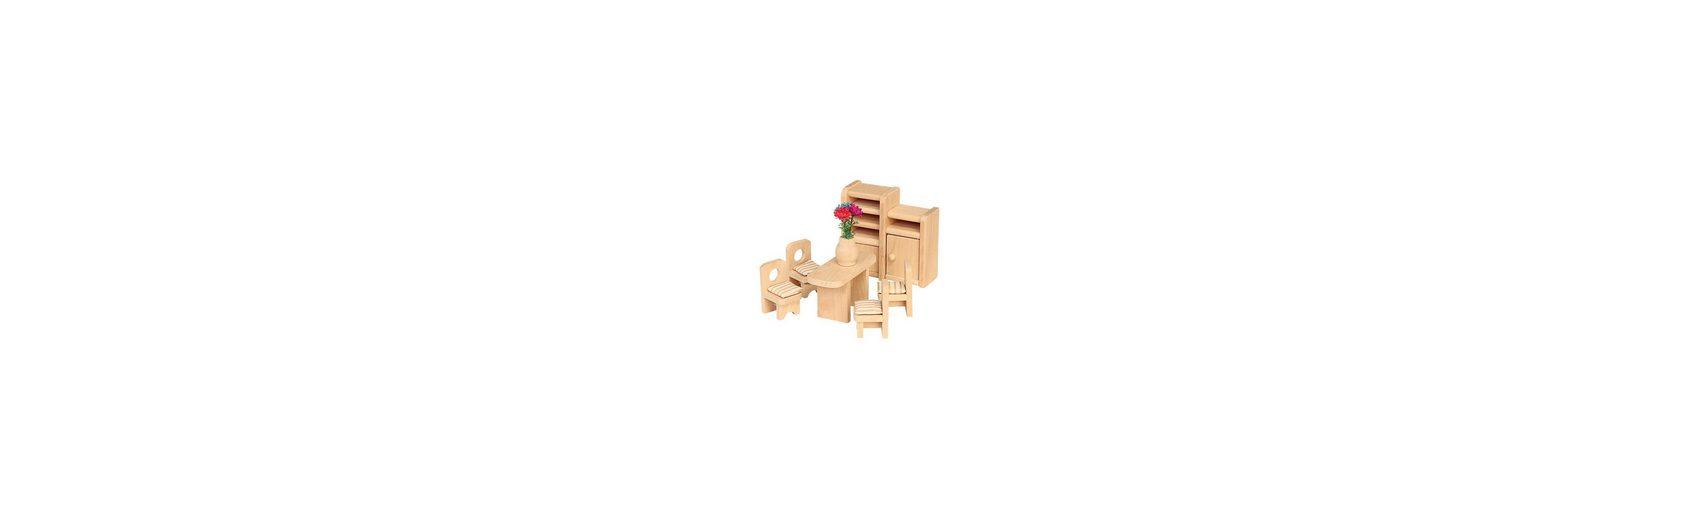 Beluga Puppenhausmöbel Esszimmer